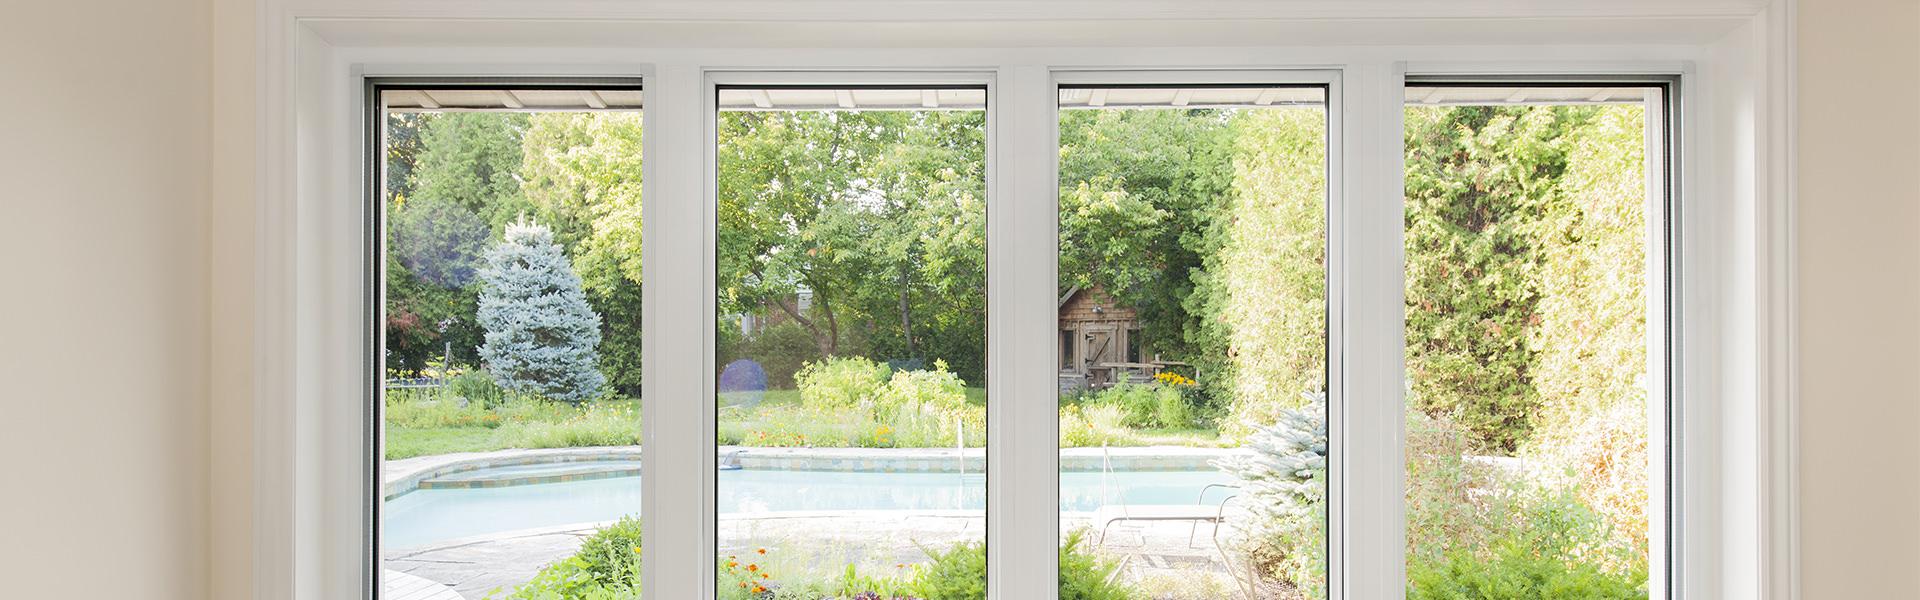 Upvc Windows Buckhurst Hill Upvc Window Prices Essex